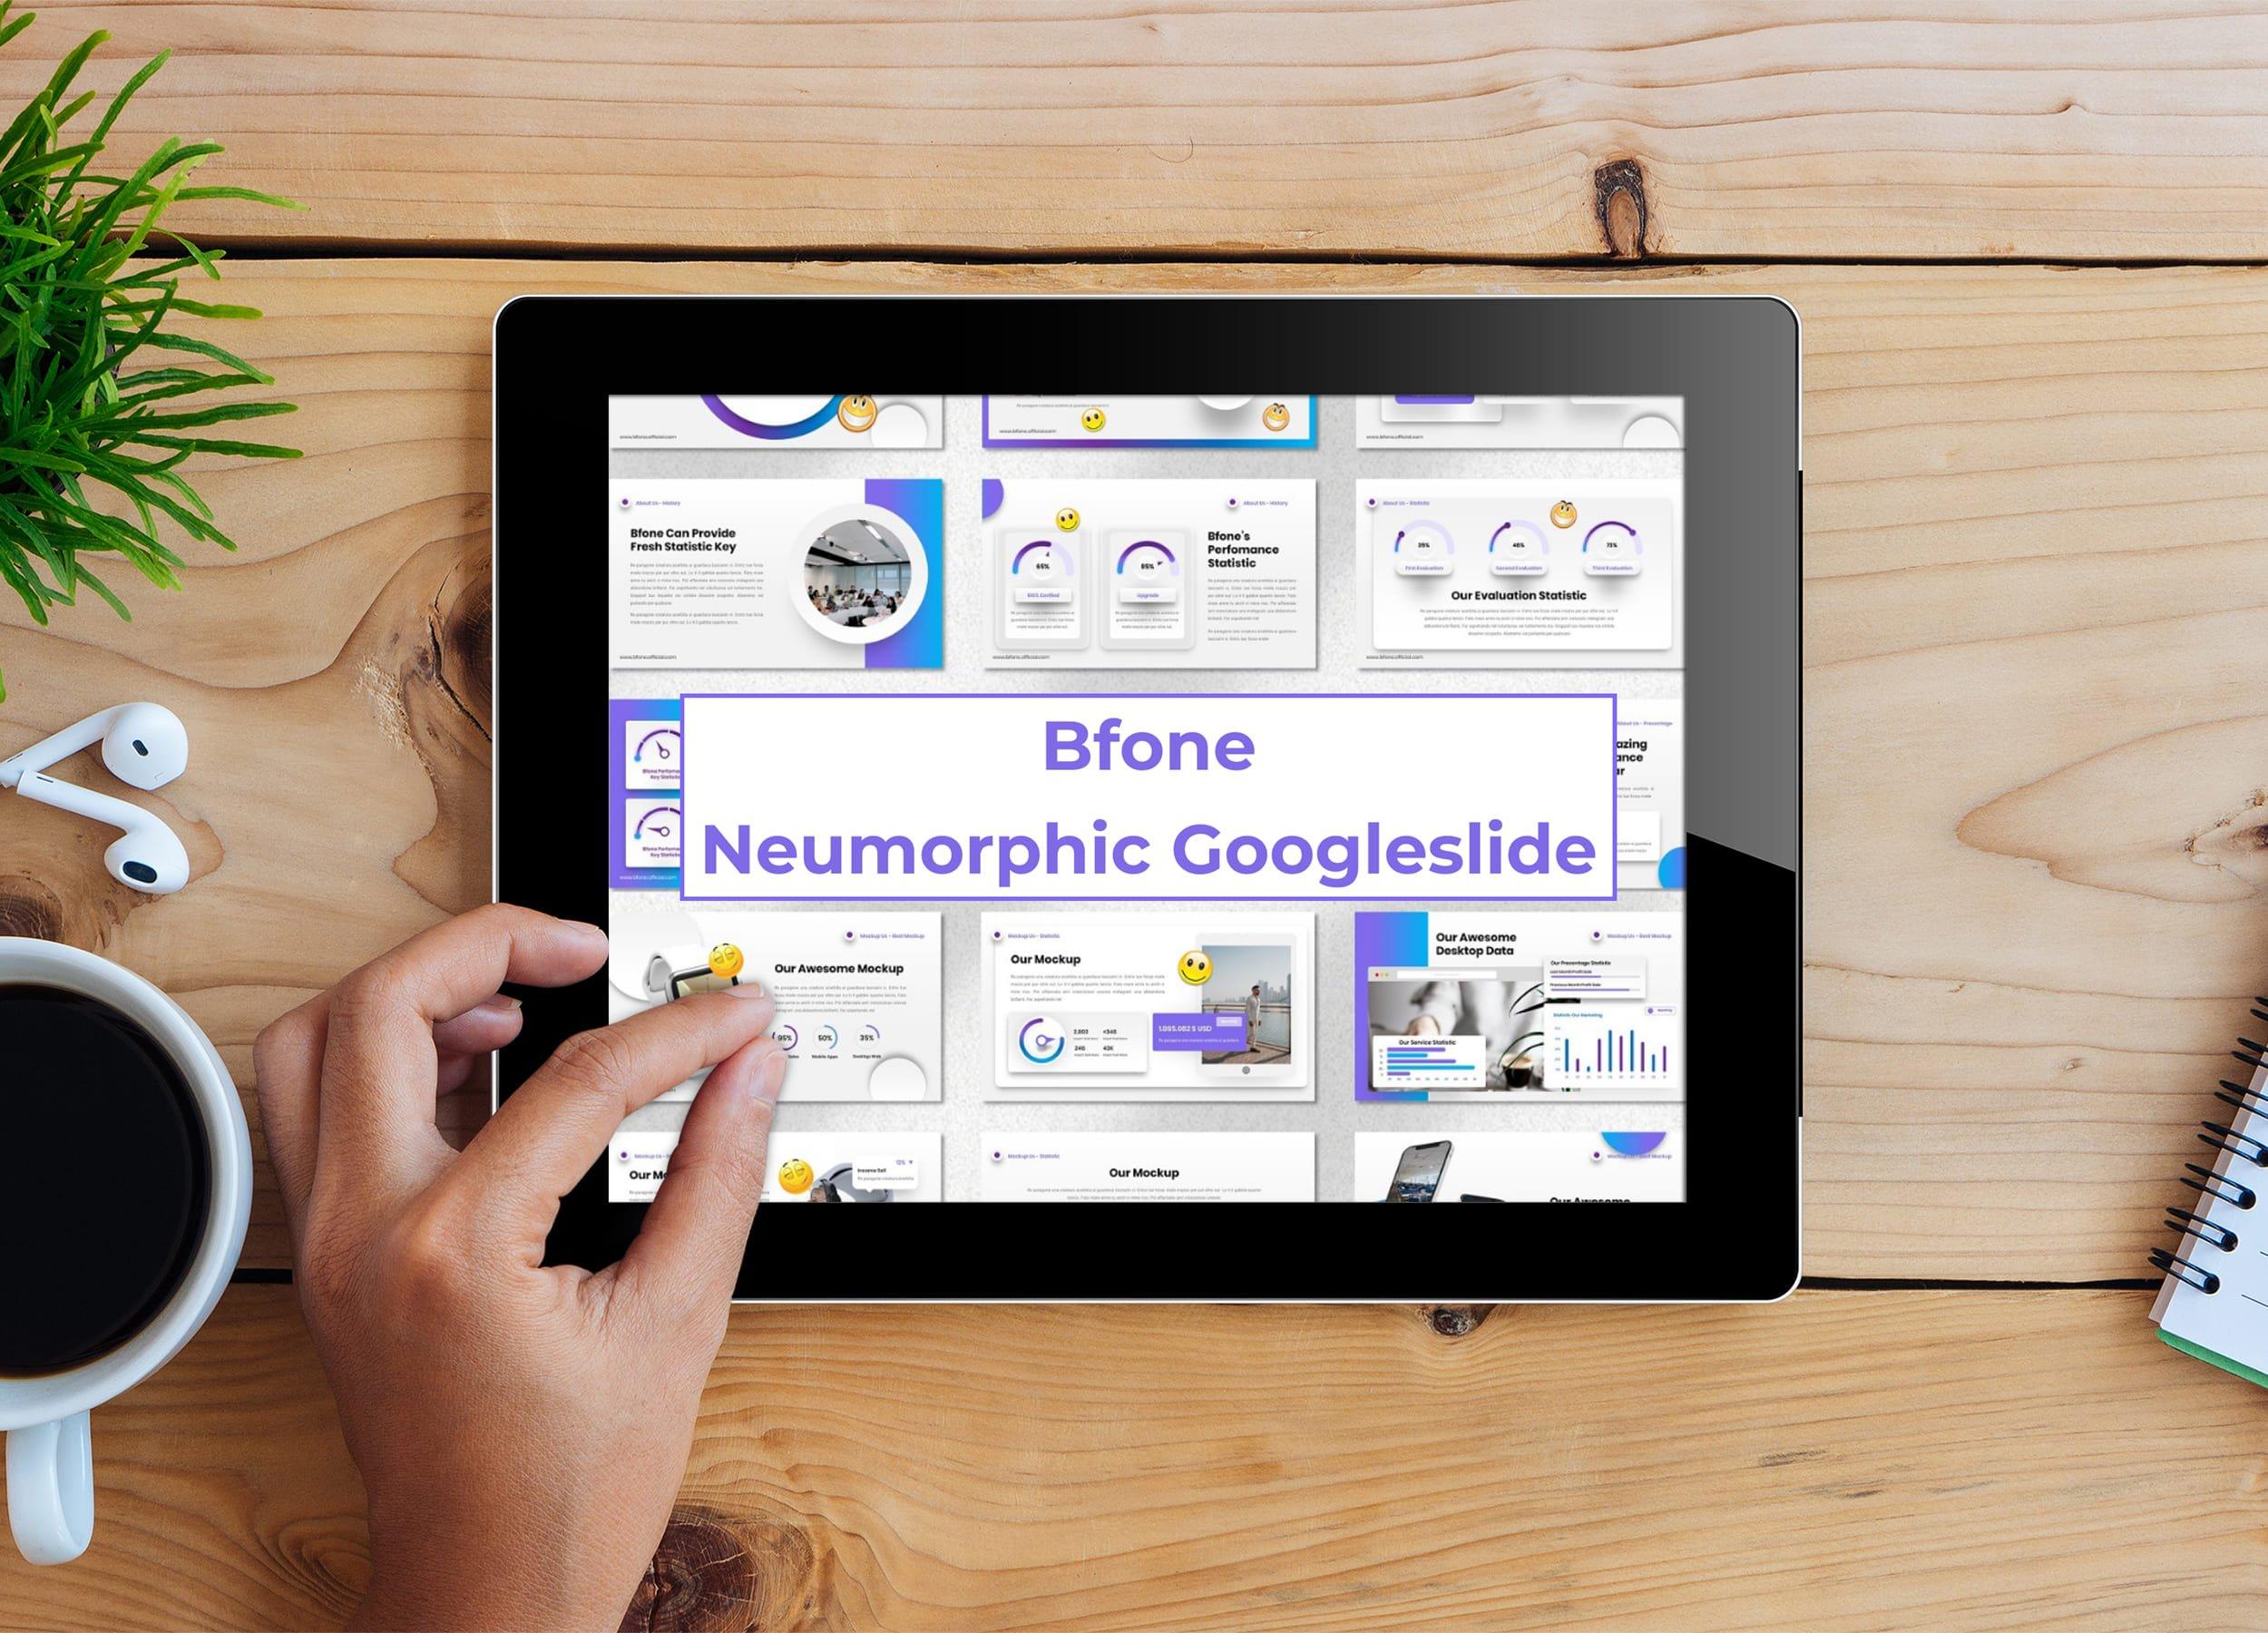 Tablet option of the Bfone - Neumorphic Googleslide.